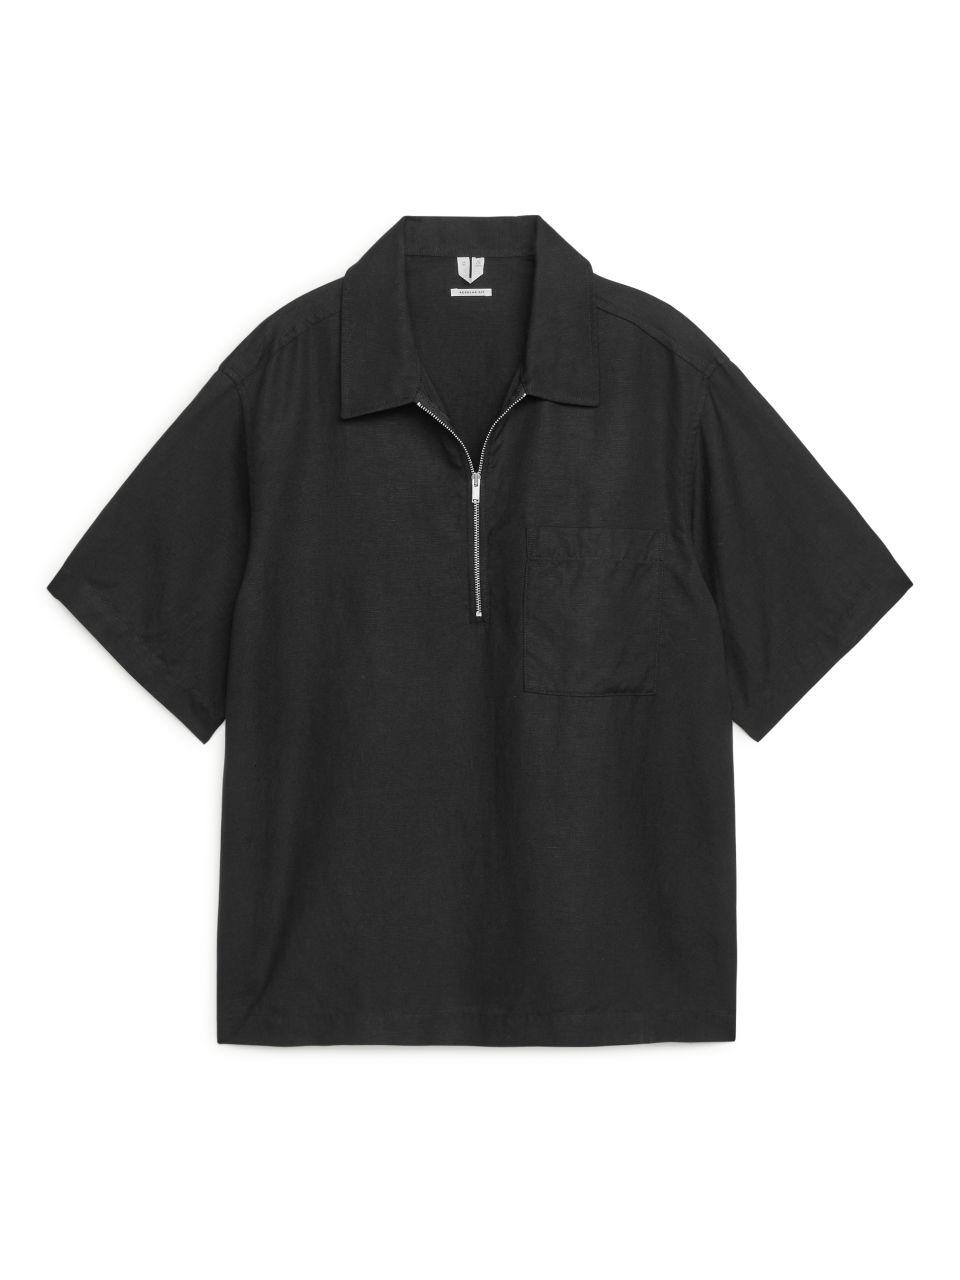 Half-Zip Short-Sleeved Shirt - Black